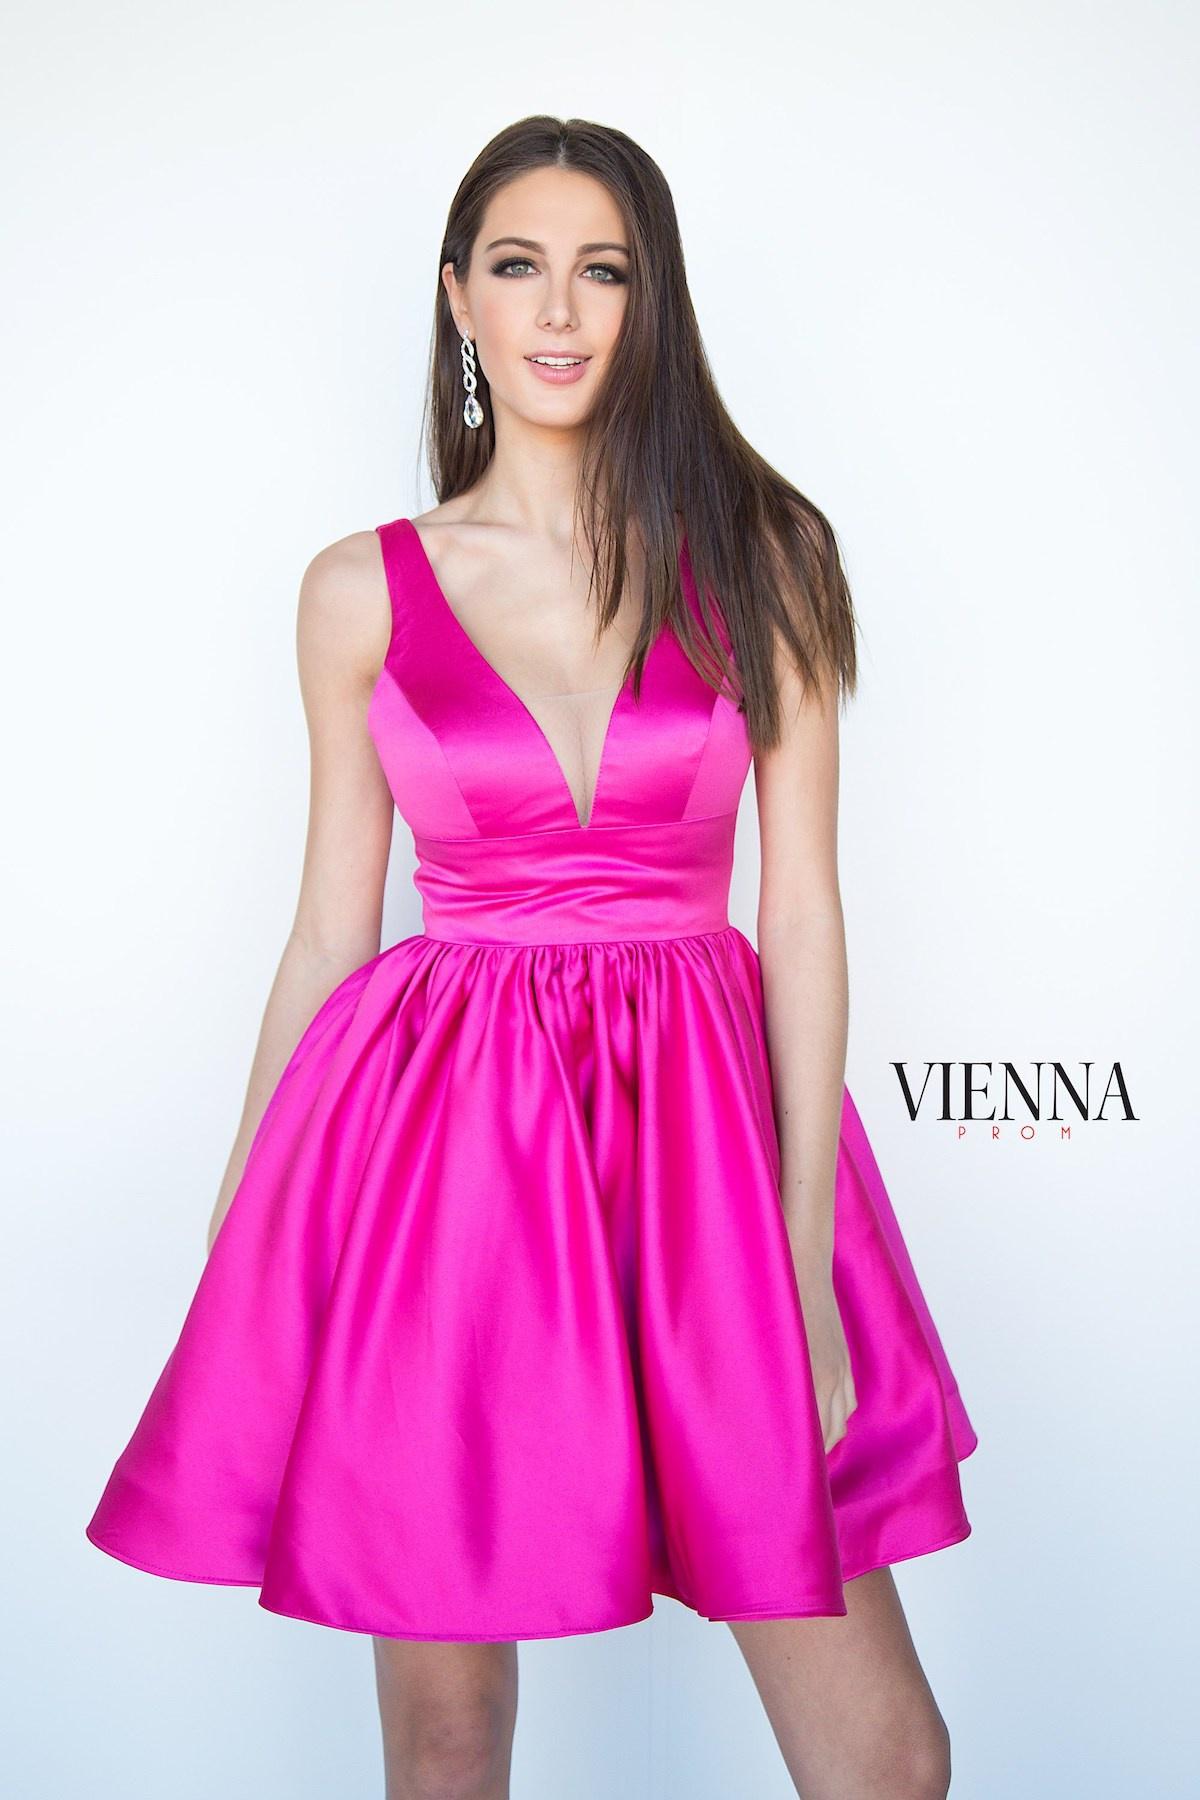 Style 6023 Vienna Pink Size 8 Plunge Interview Cocktail Dress on Queenly